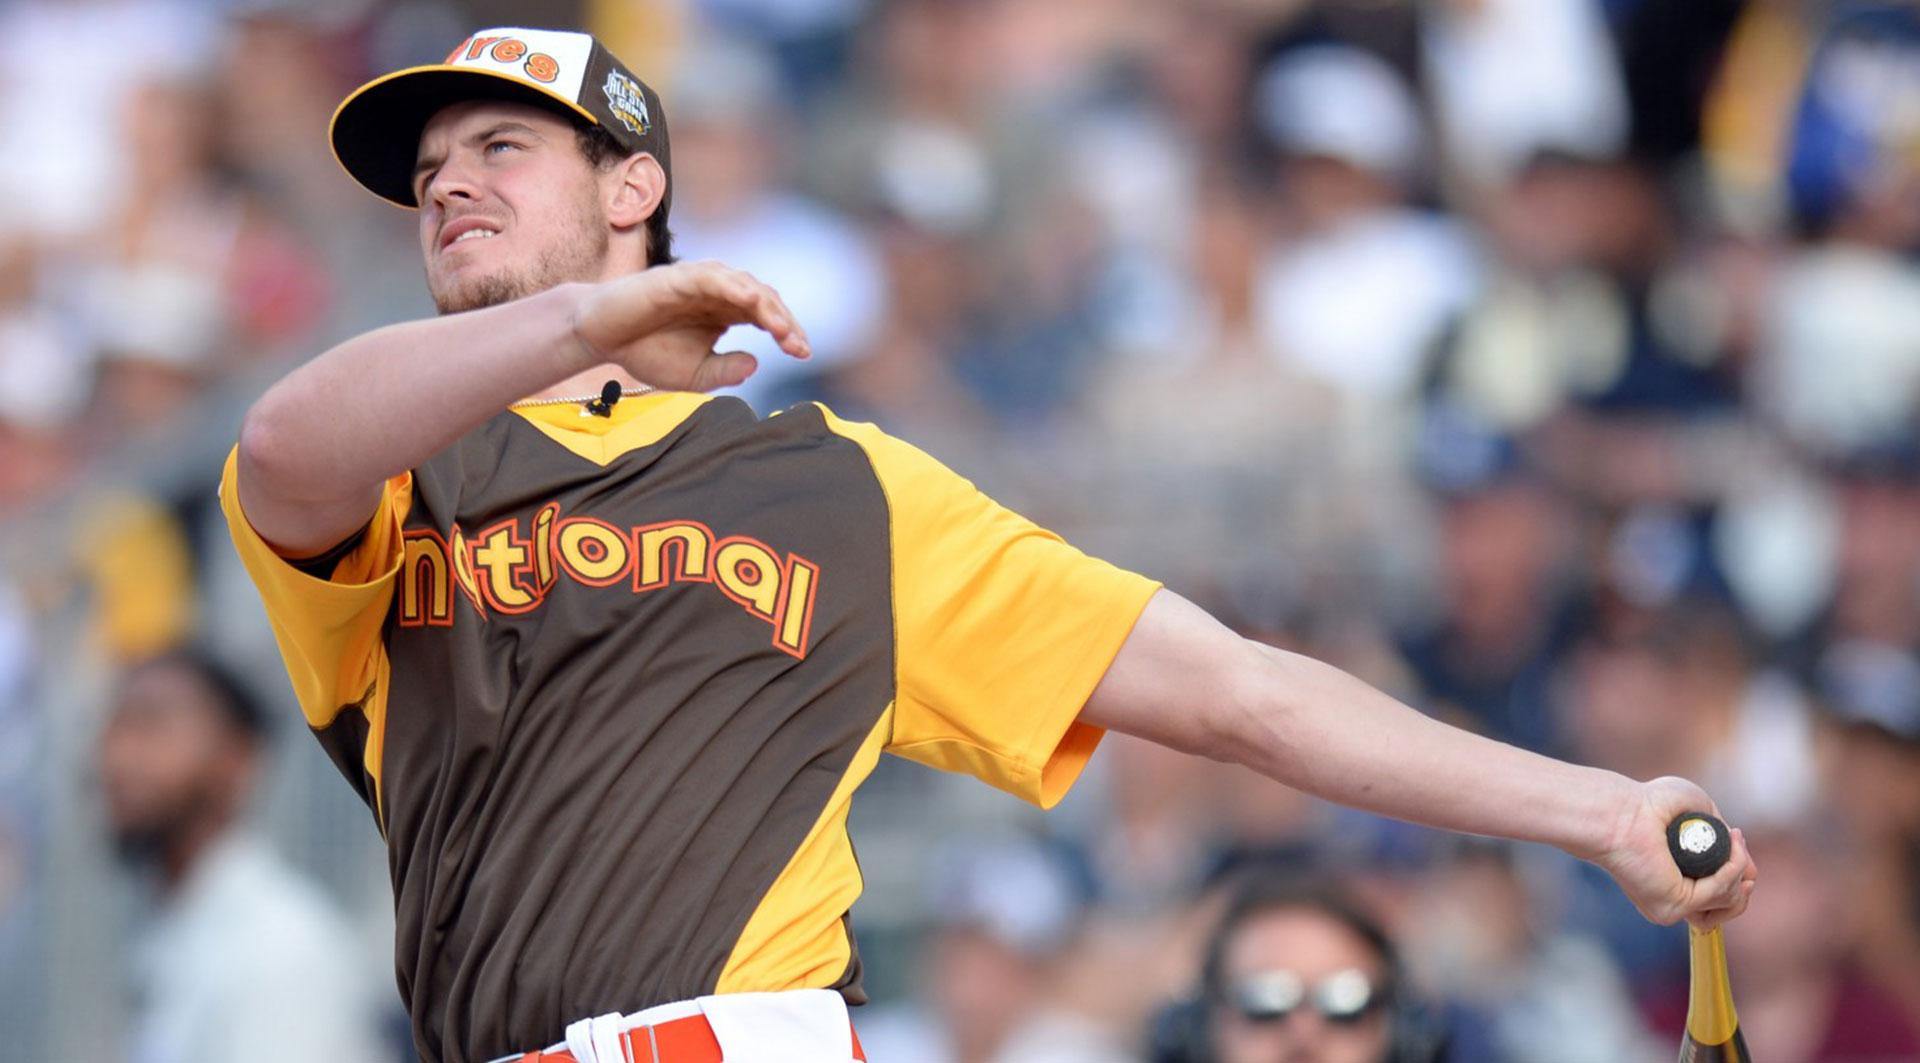 2020 MLB All-Star Game Travel Packages - Roadtrips